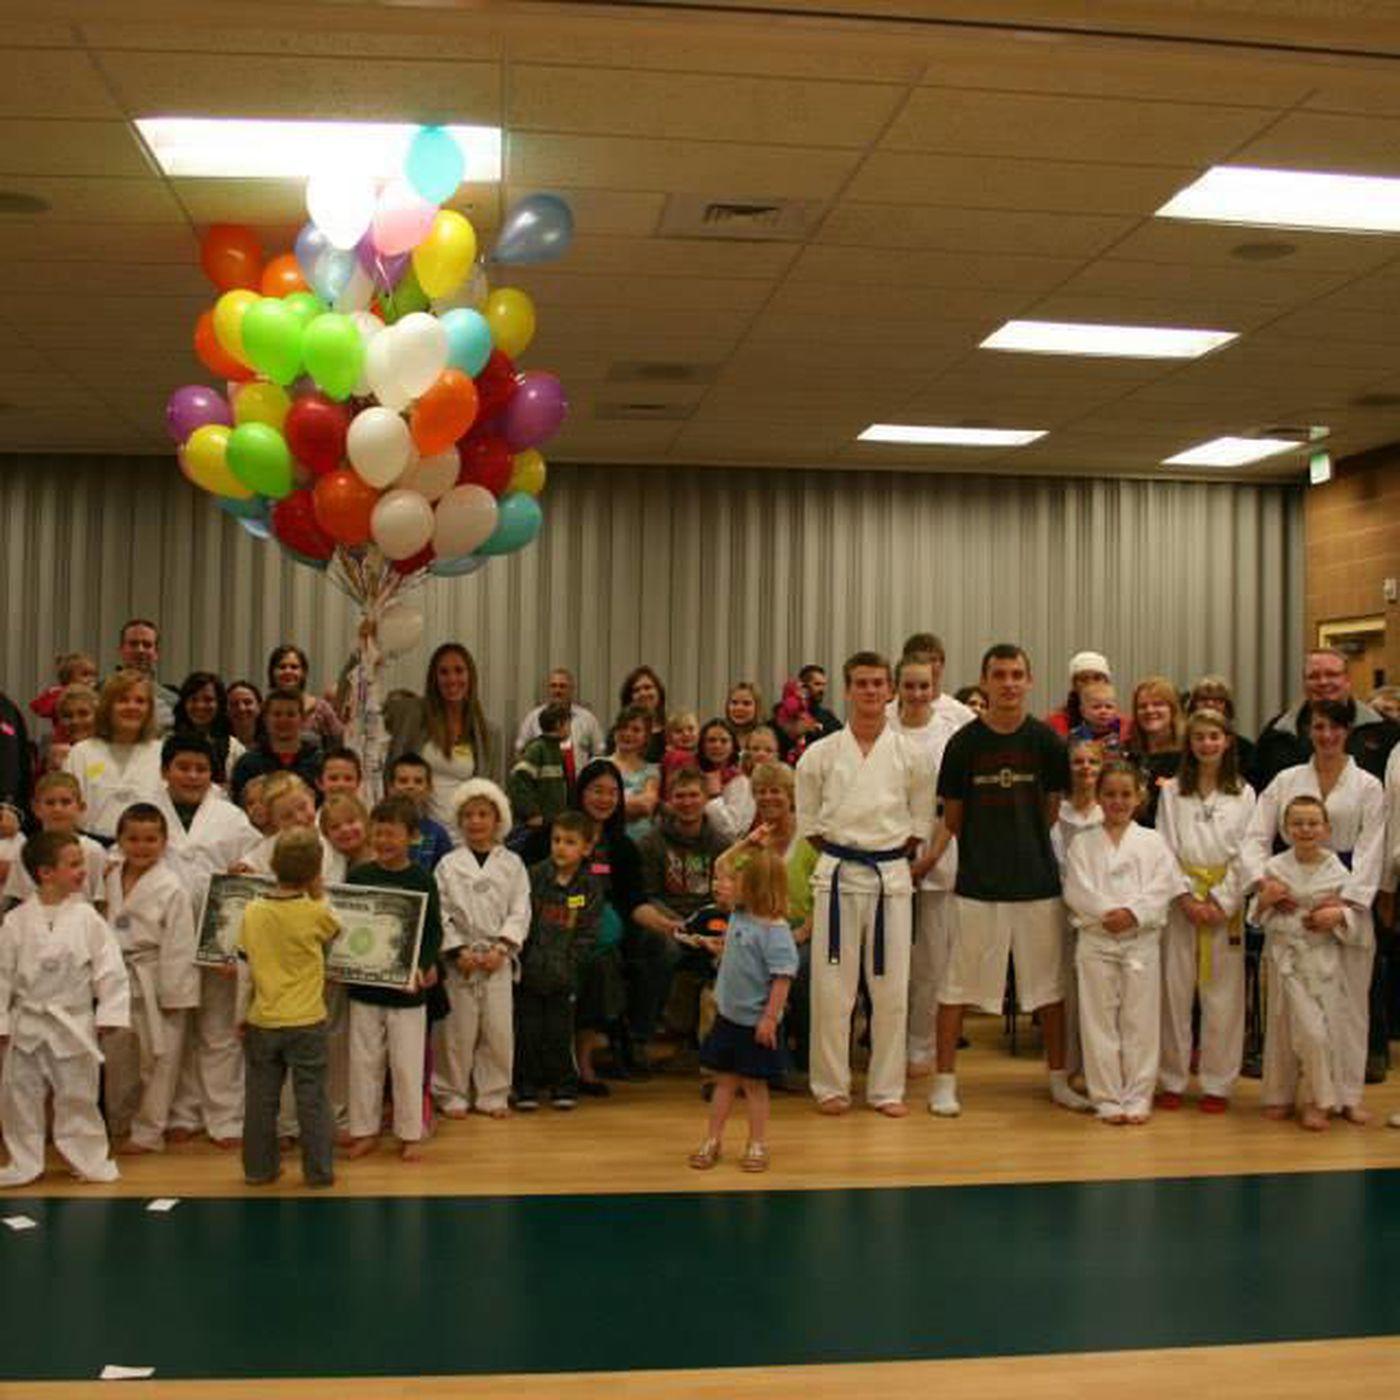 Cedar City taekwondo instructor donates funds to help women